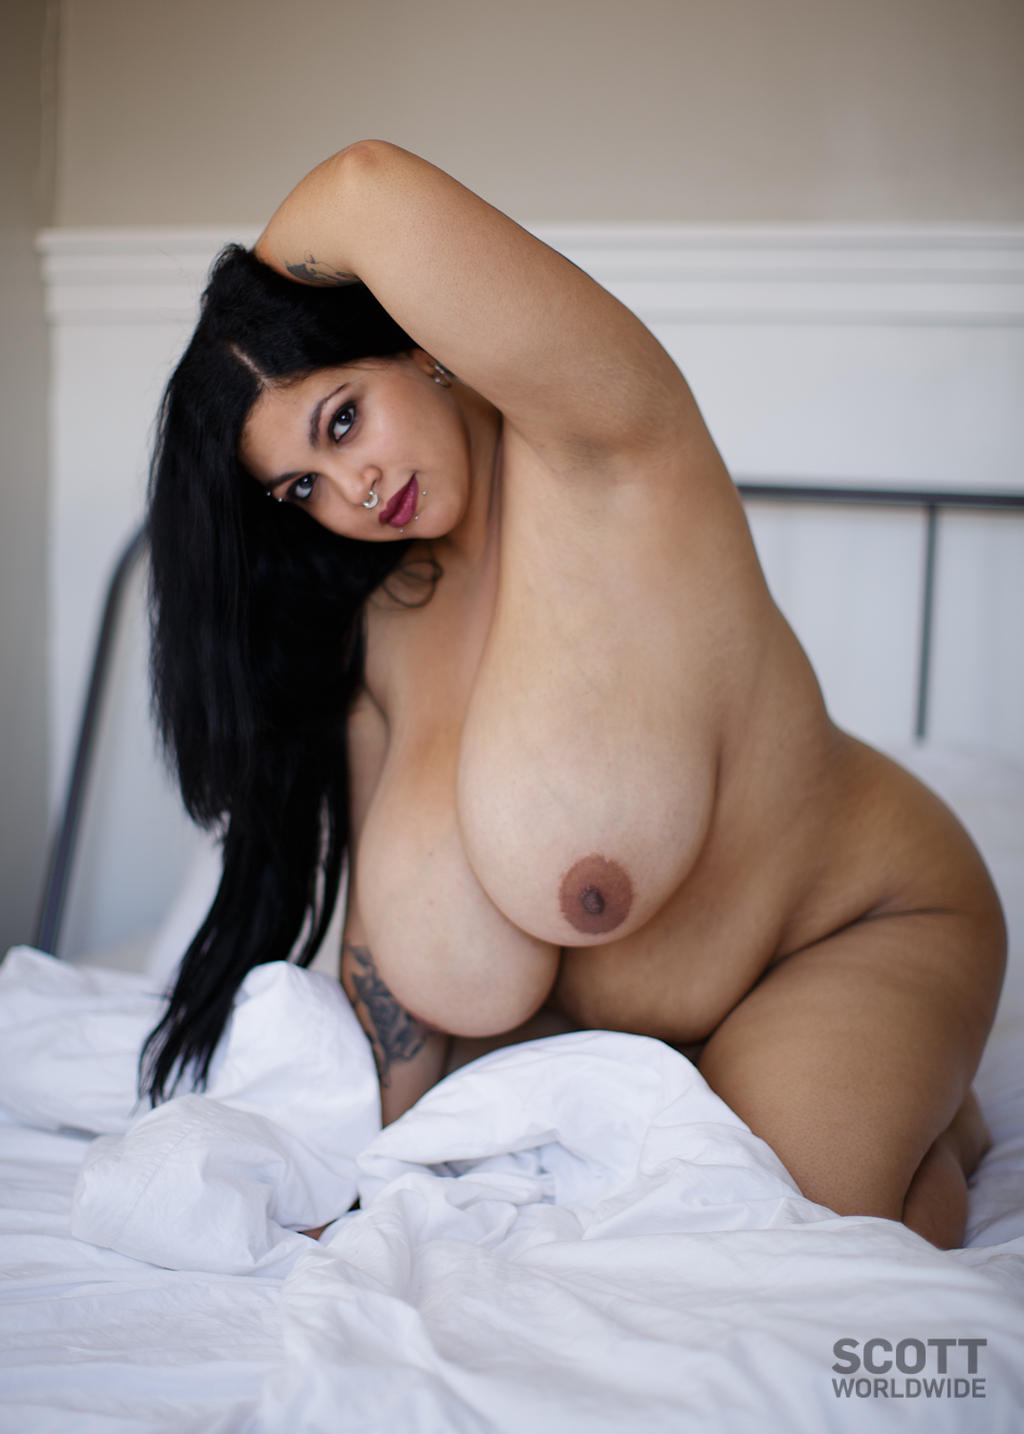 Zoe nova porn